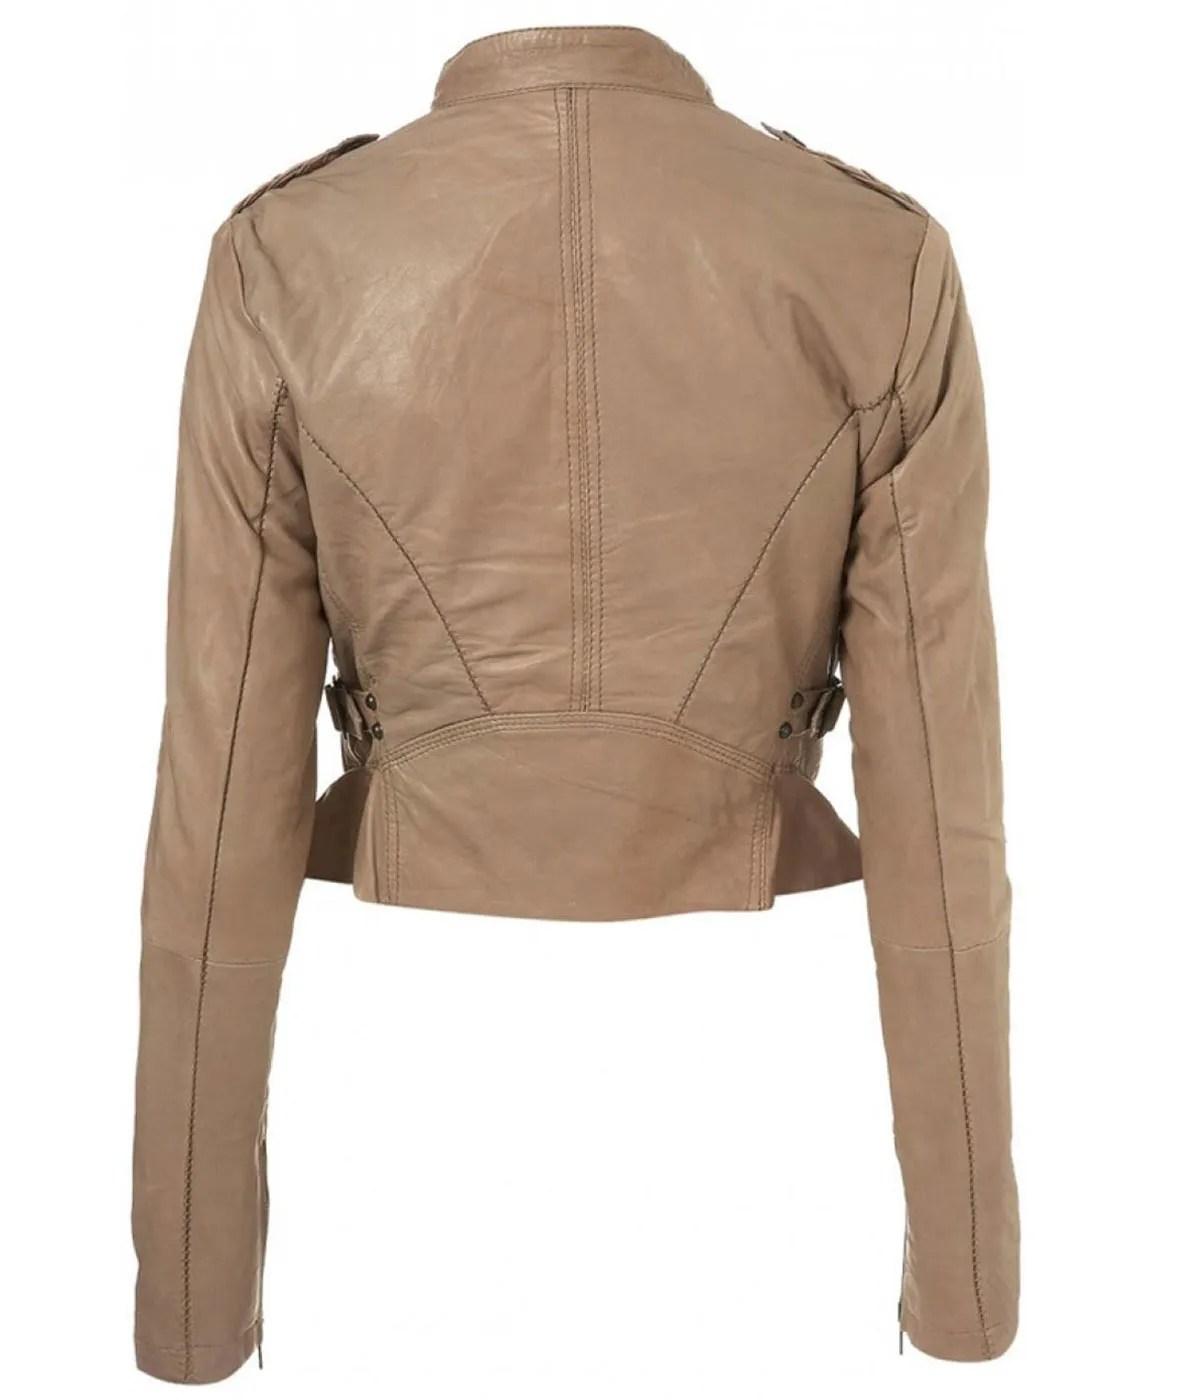 karen-gillan-doctor-who-amy-pond-leather-jacket